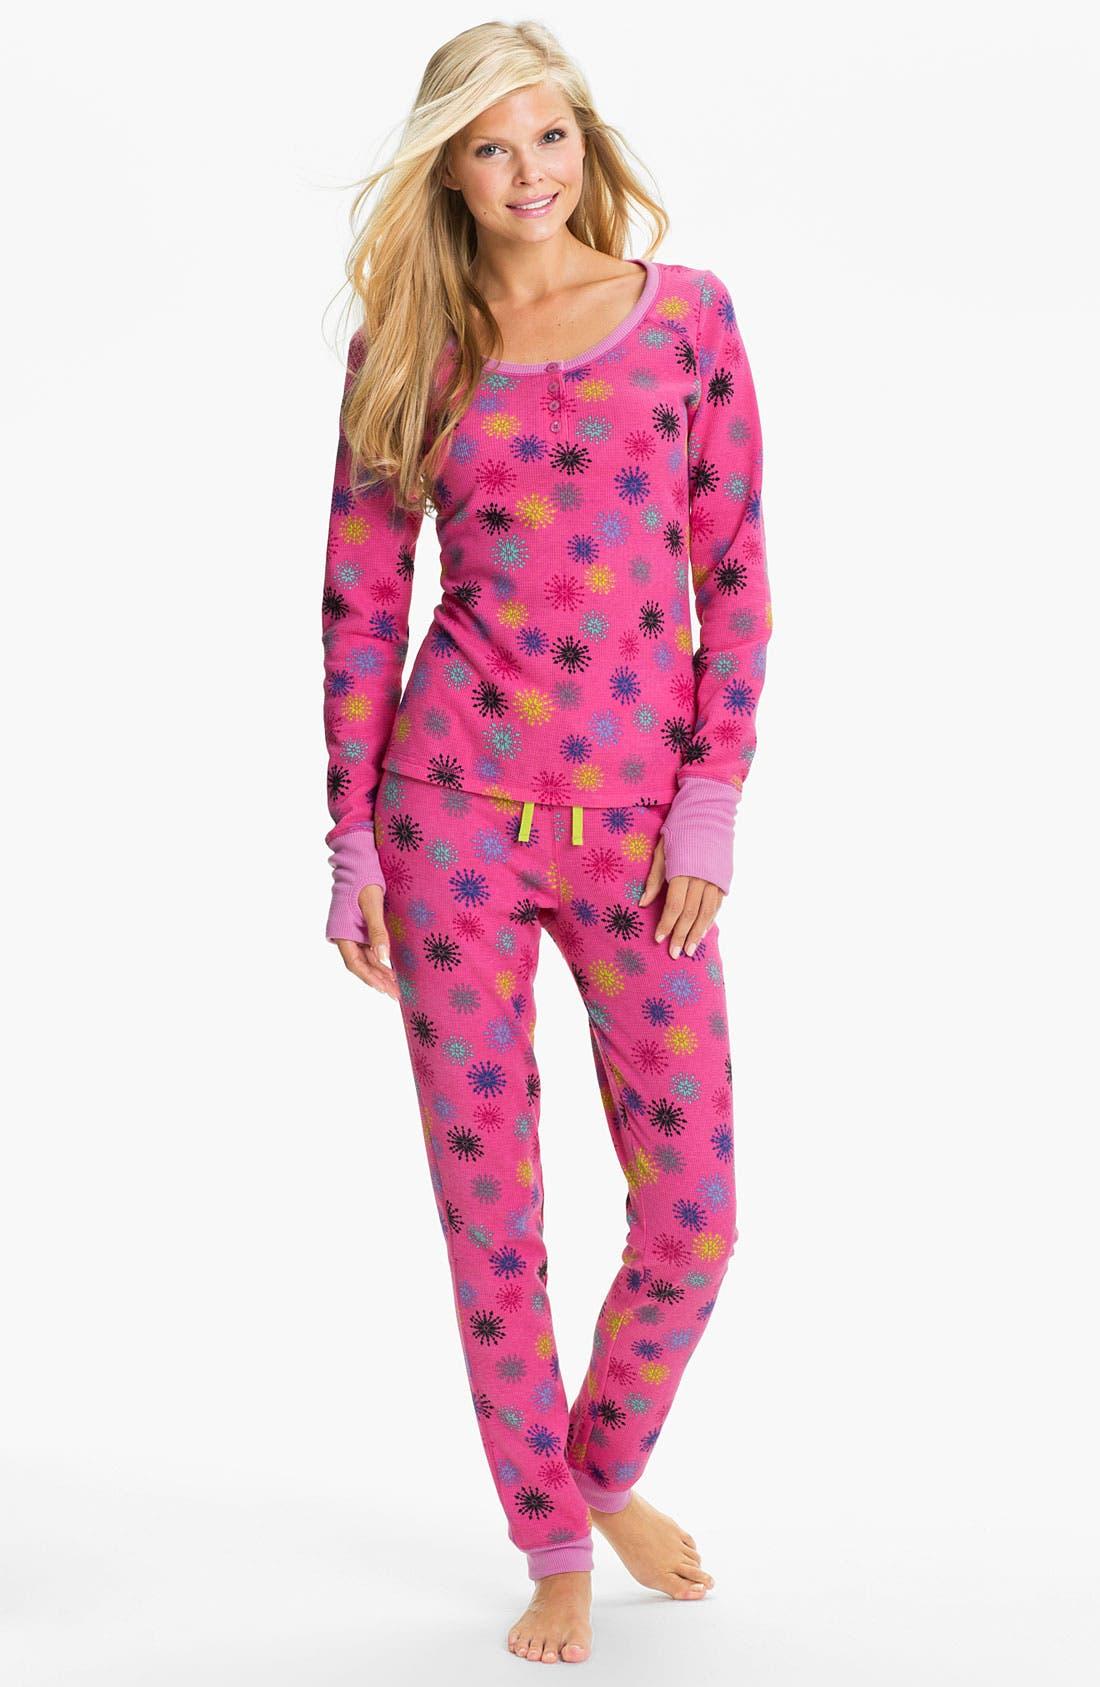 Alternate Image 1 Selected - Steve Madden 'Cozy Up' Print Thermal Pajamas